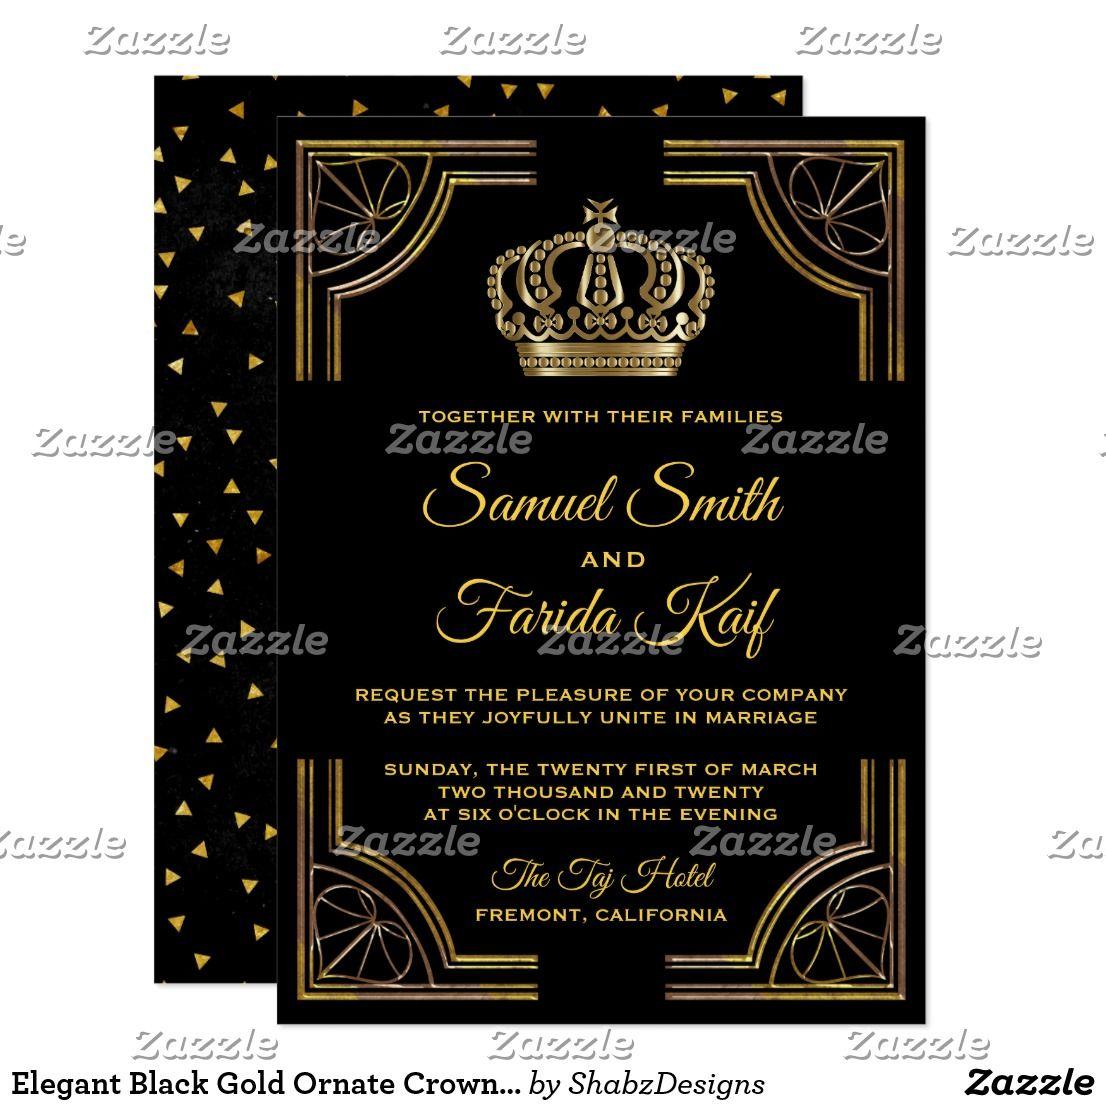 Elegant Black Gold Ornate Crown Wedding Invitation Muslim